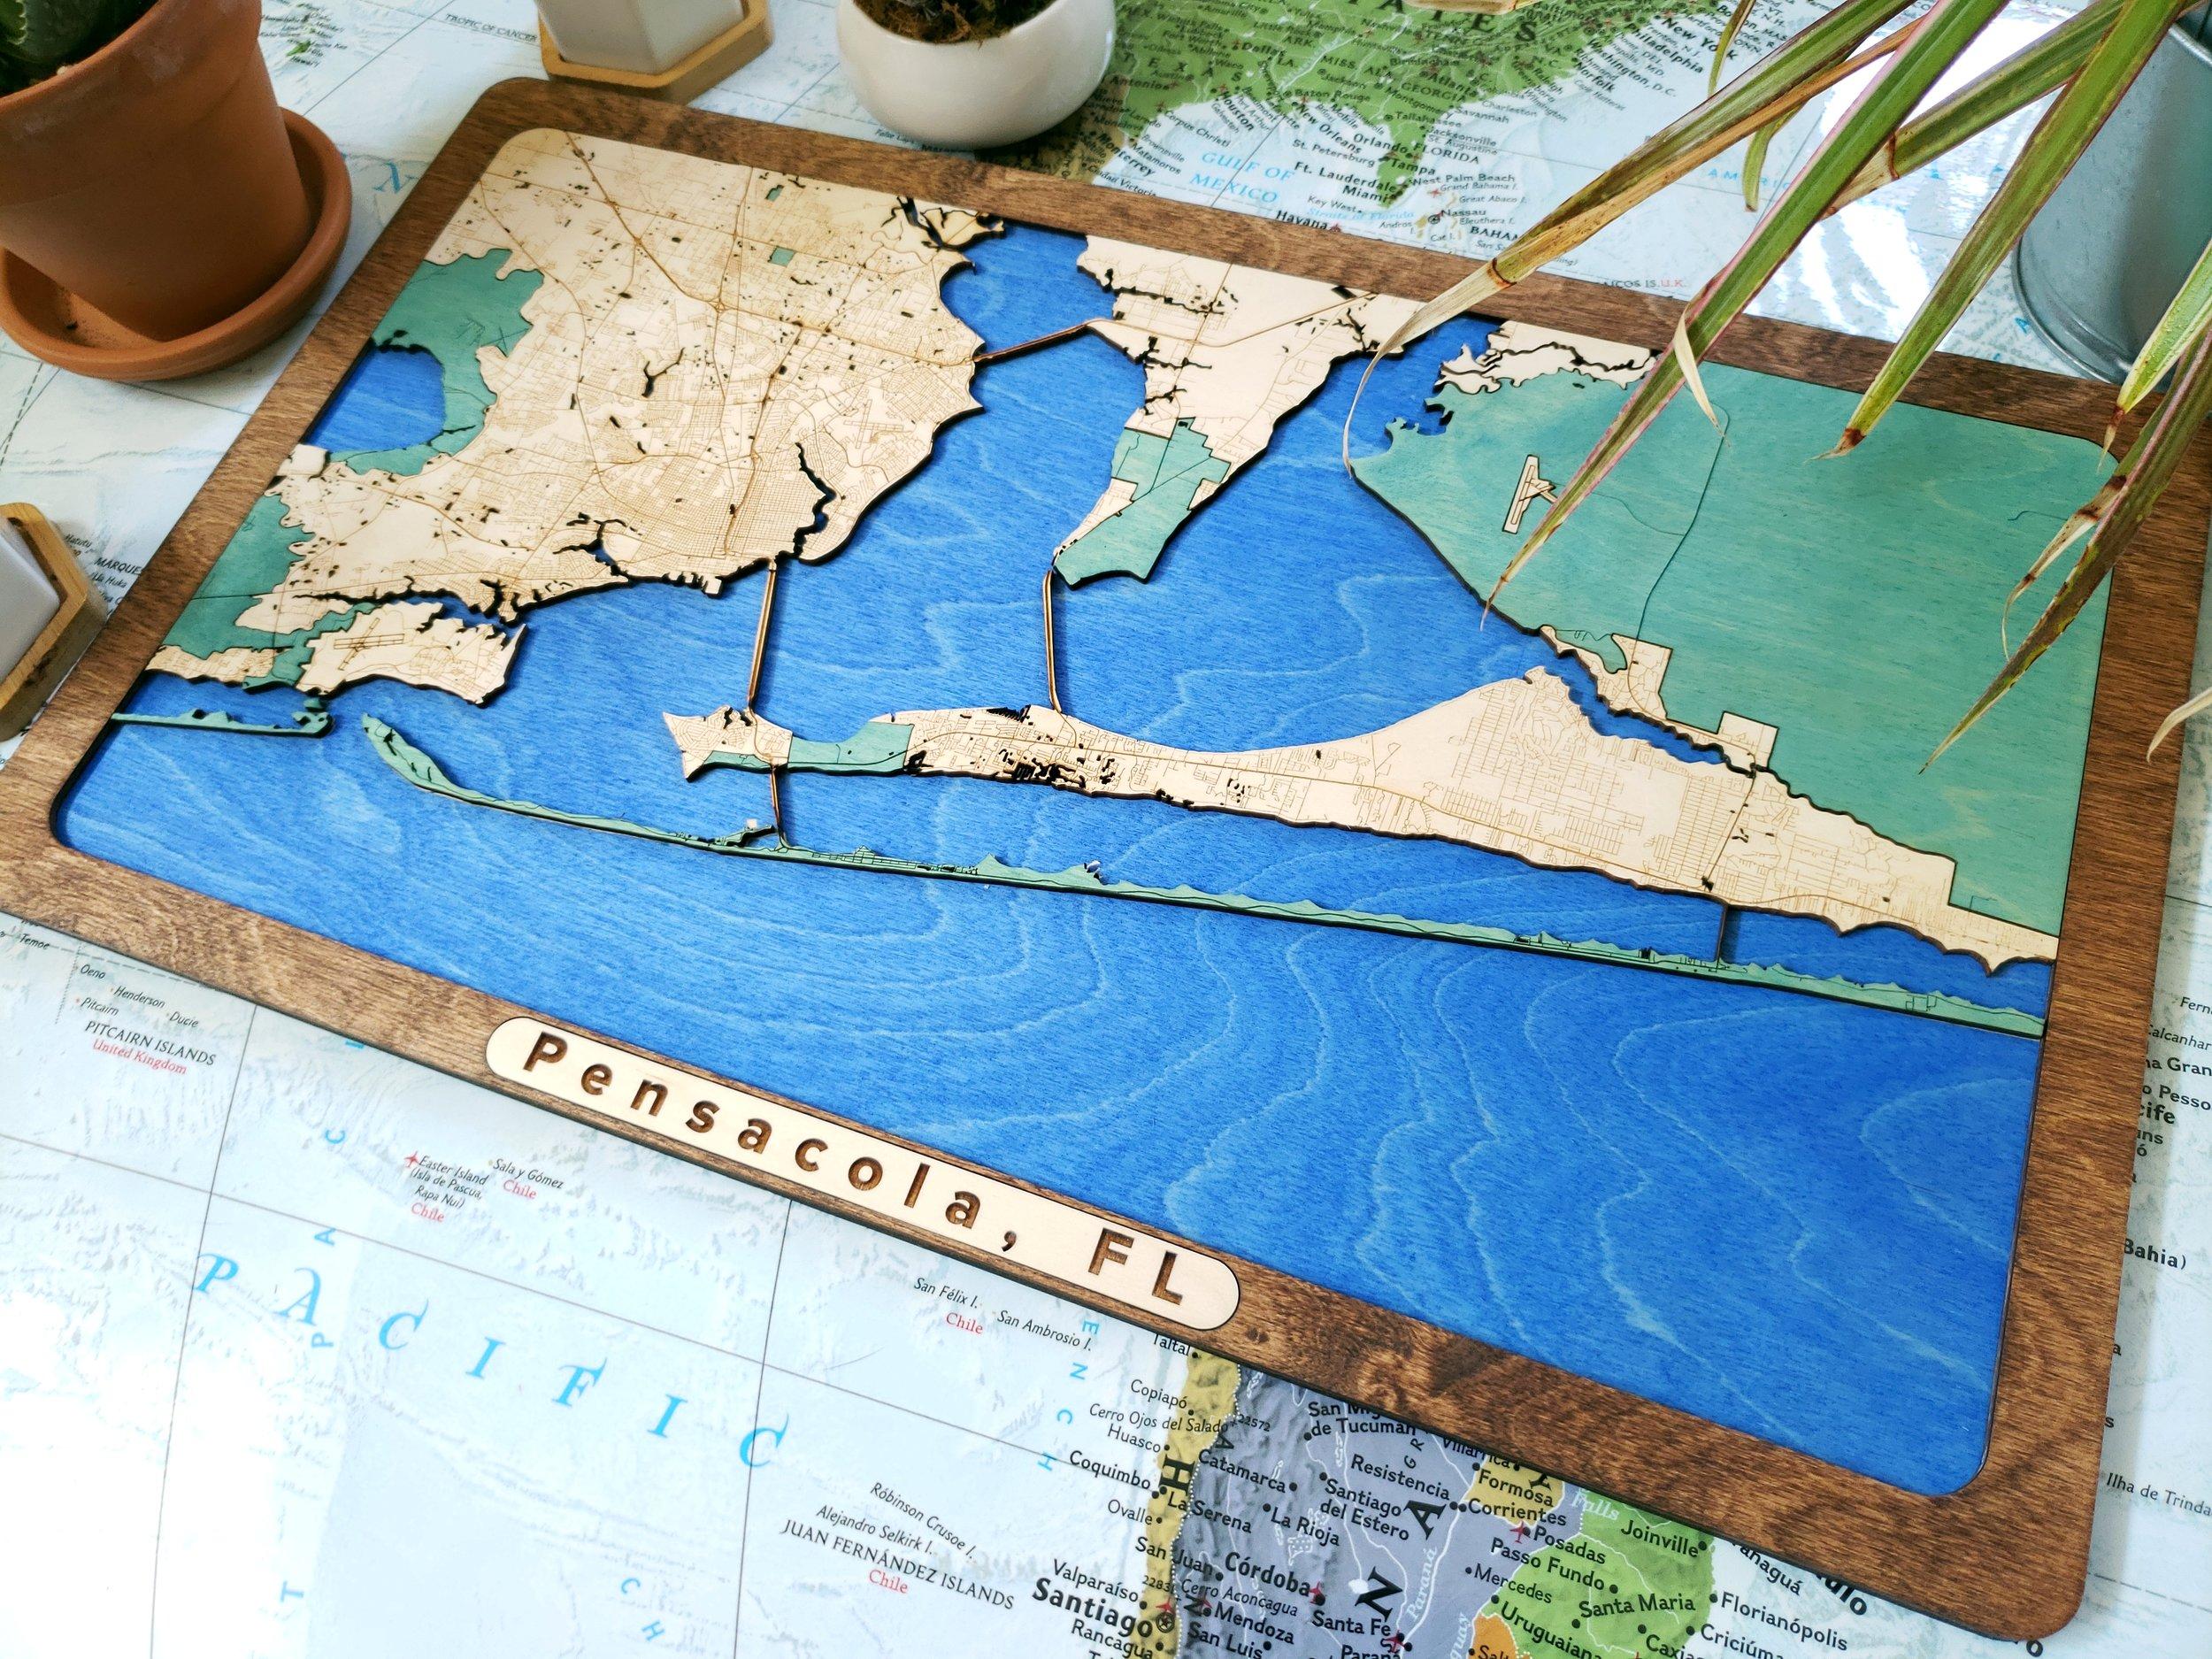 Pensacola Wooden Map, Custom Wooden Maps, Custom Wooden Map, Wooden Maps, Wood Map, Pensacola gift, Pensacola unique gift, Map gifts, world wooden map